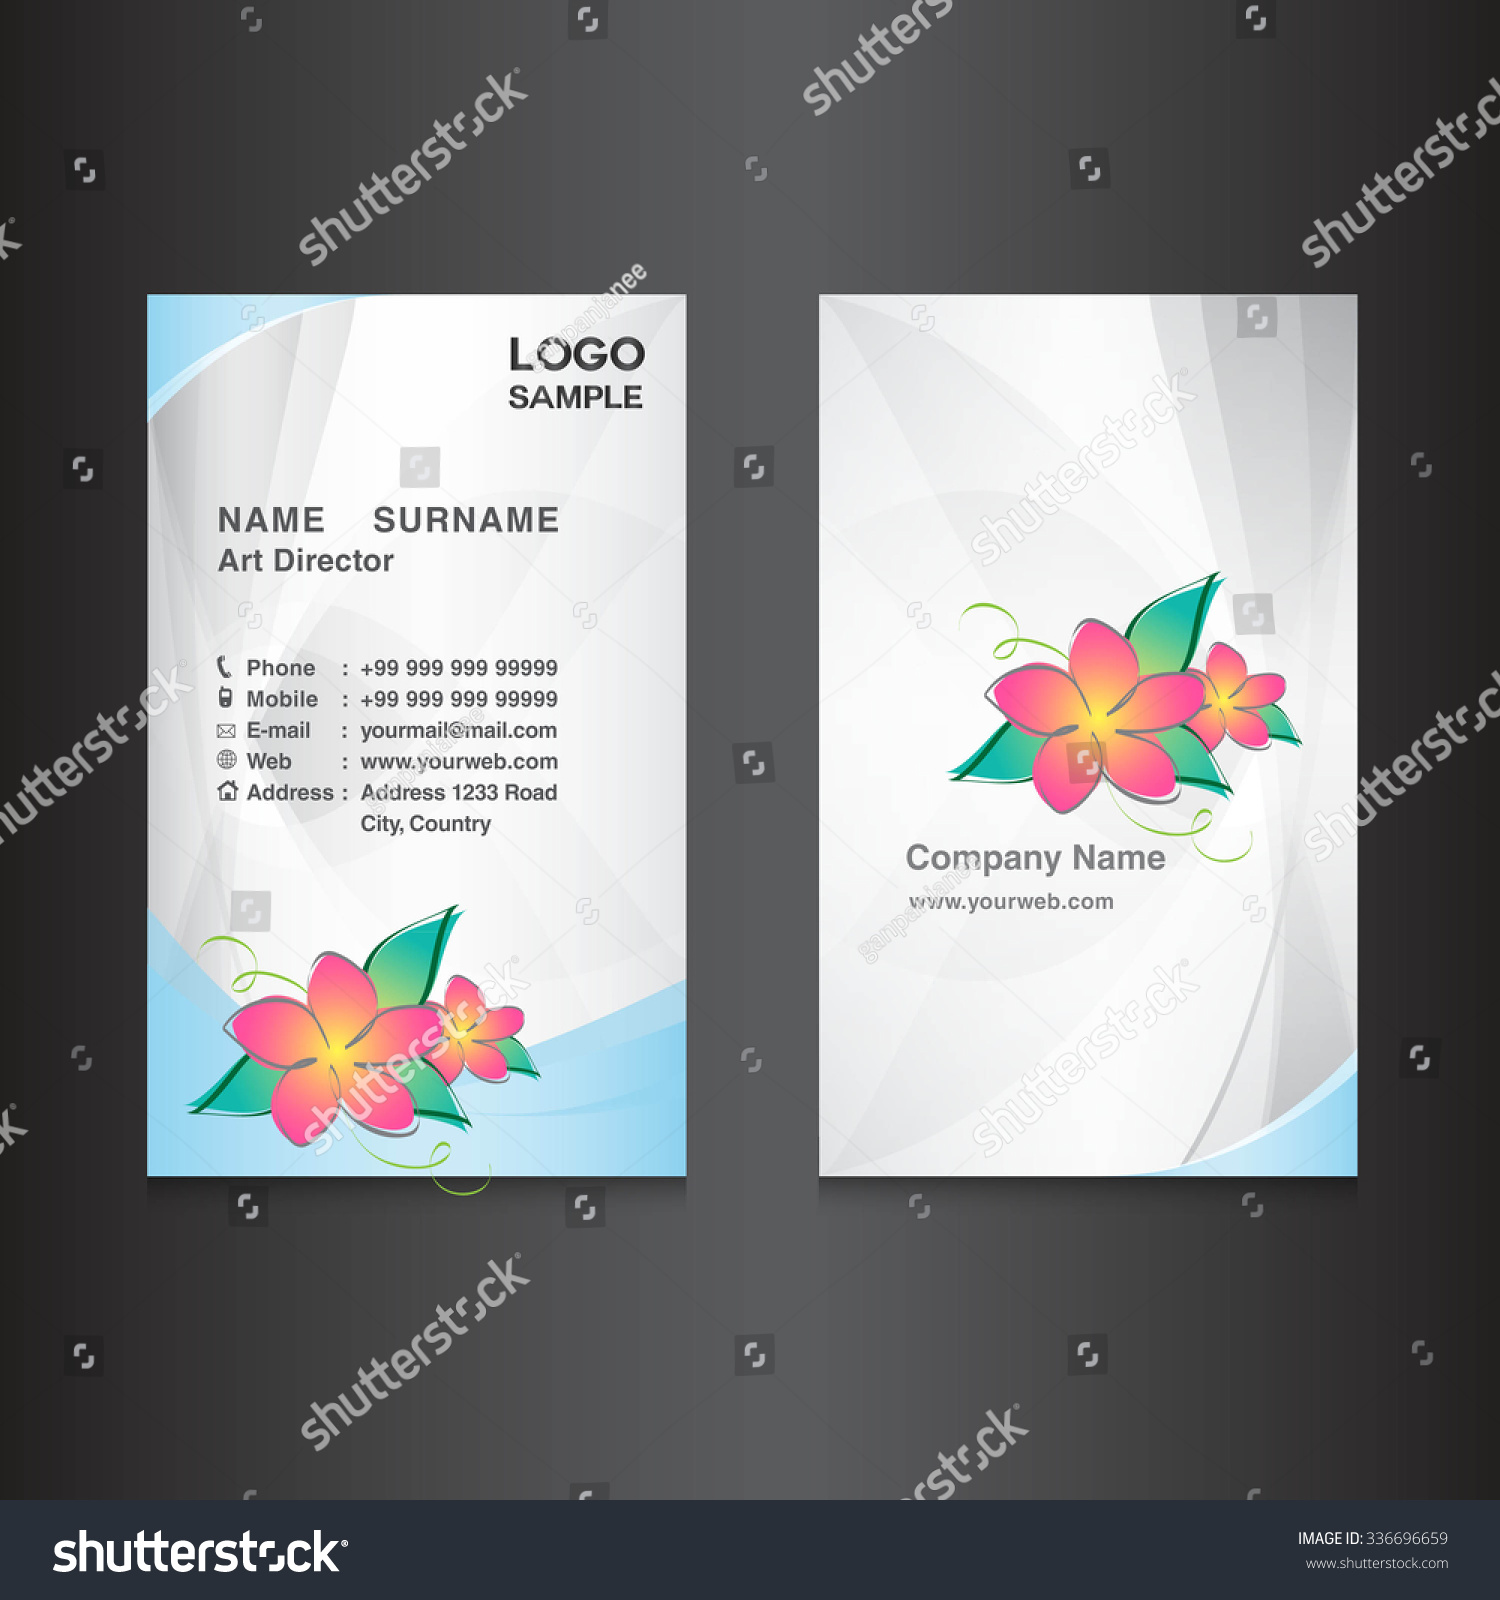 Silver business card designcard design vector stock vector silver business card designcard design vector illustrationwhite background flower vector magicingreecefo Images